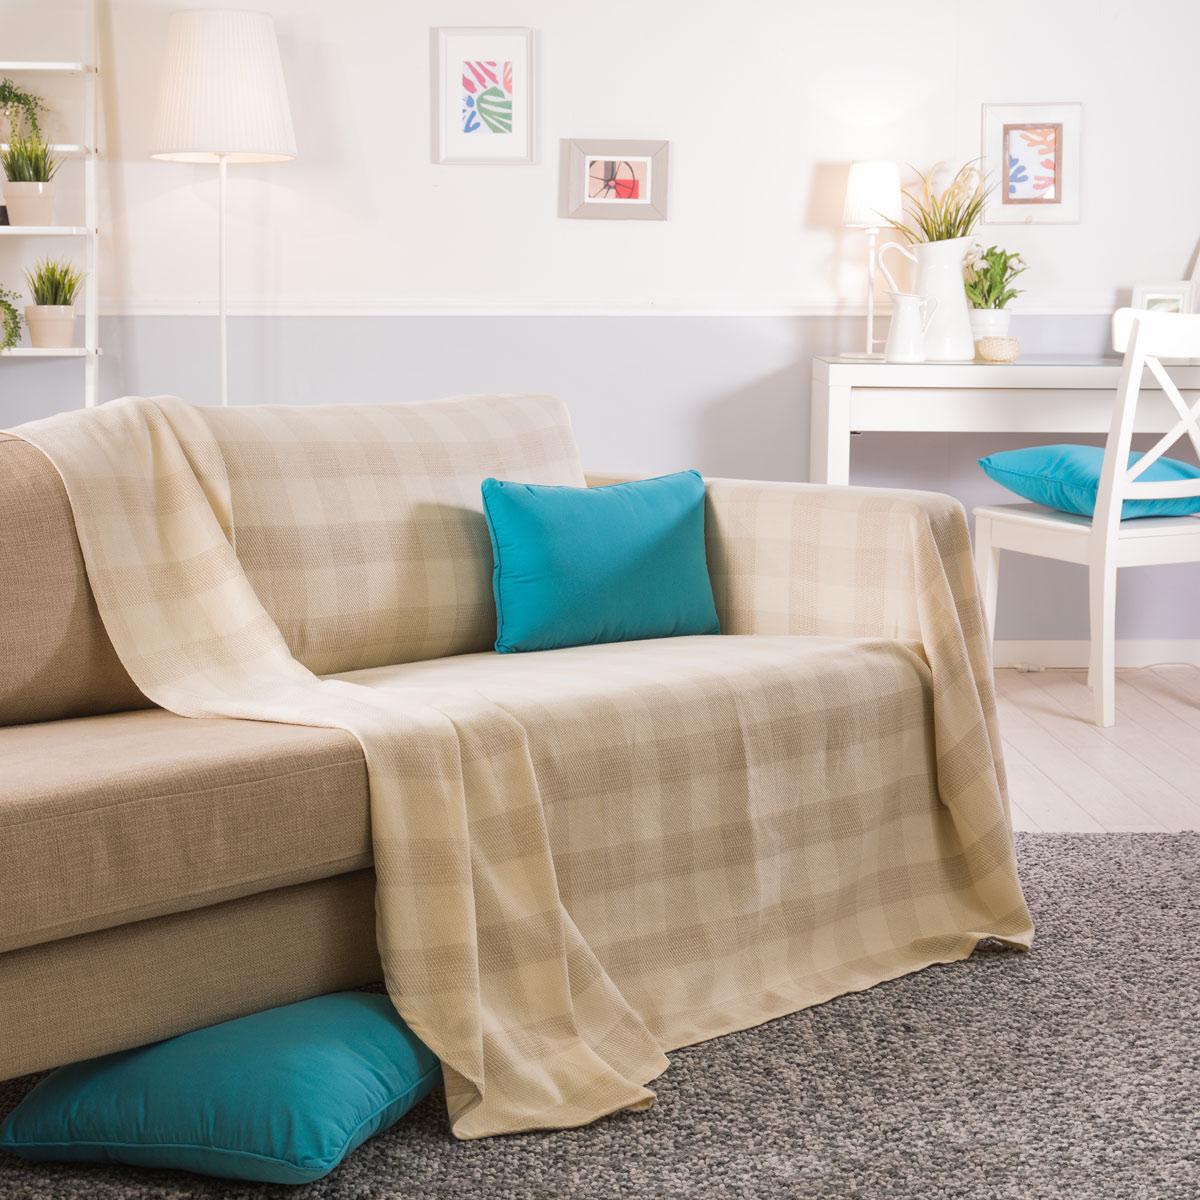 Foulard sofa Fmdf Foulard Cubresofa A Cuadros tostado Cama Individual Matrimonio sofa